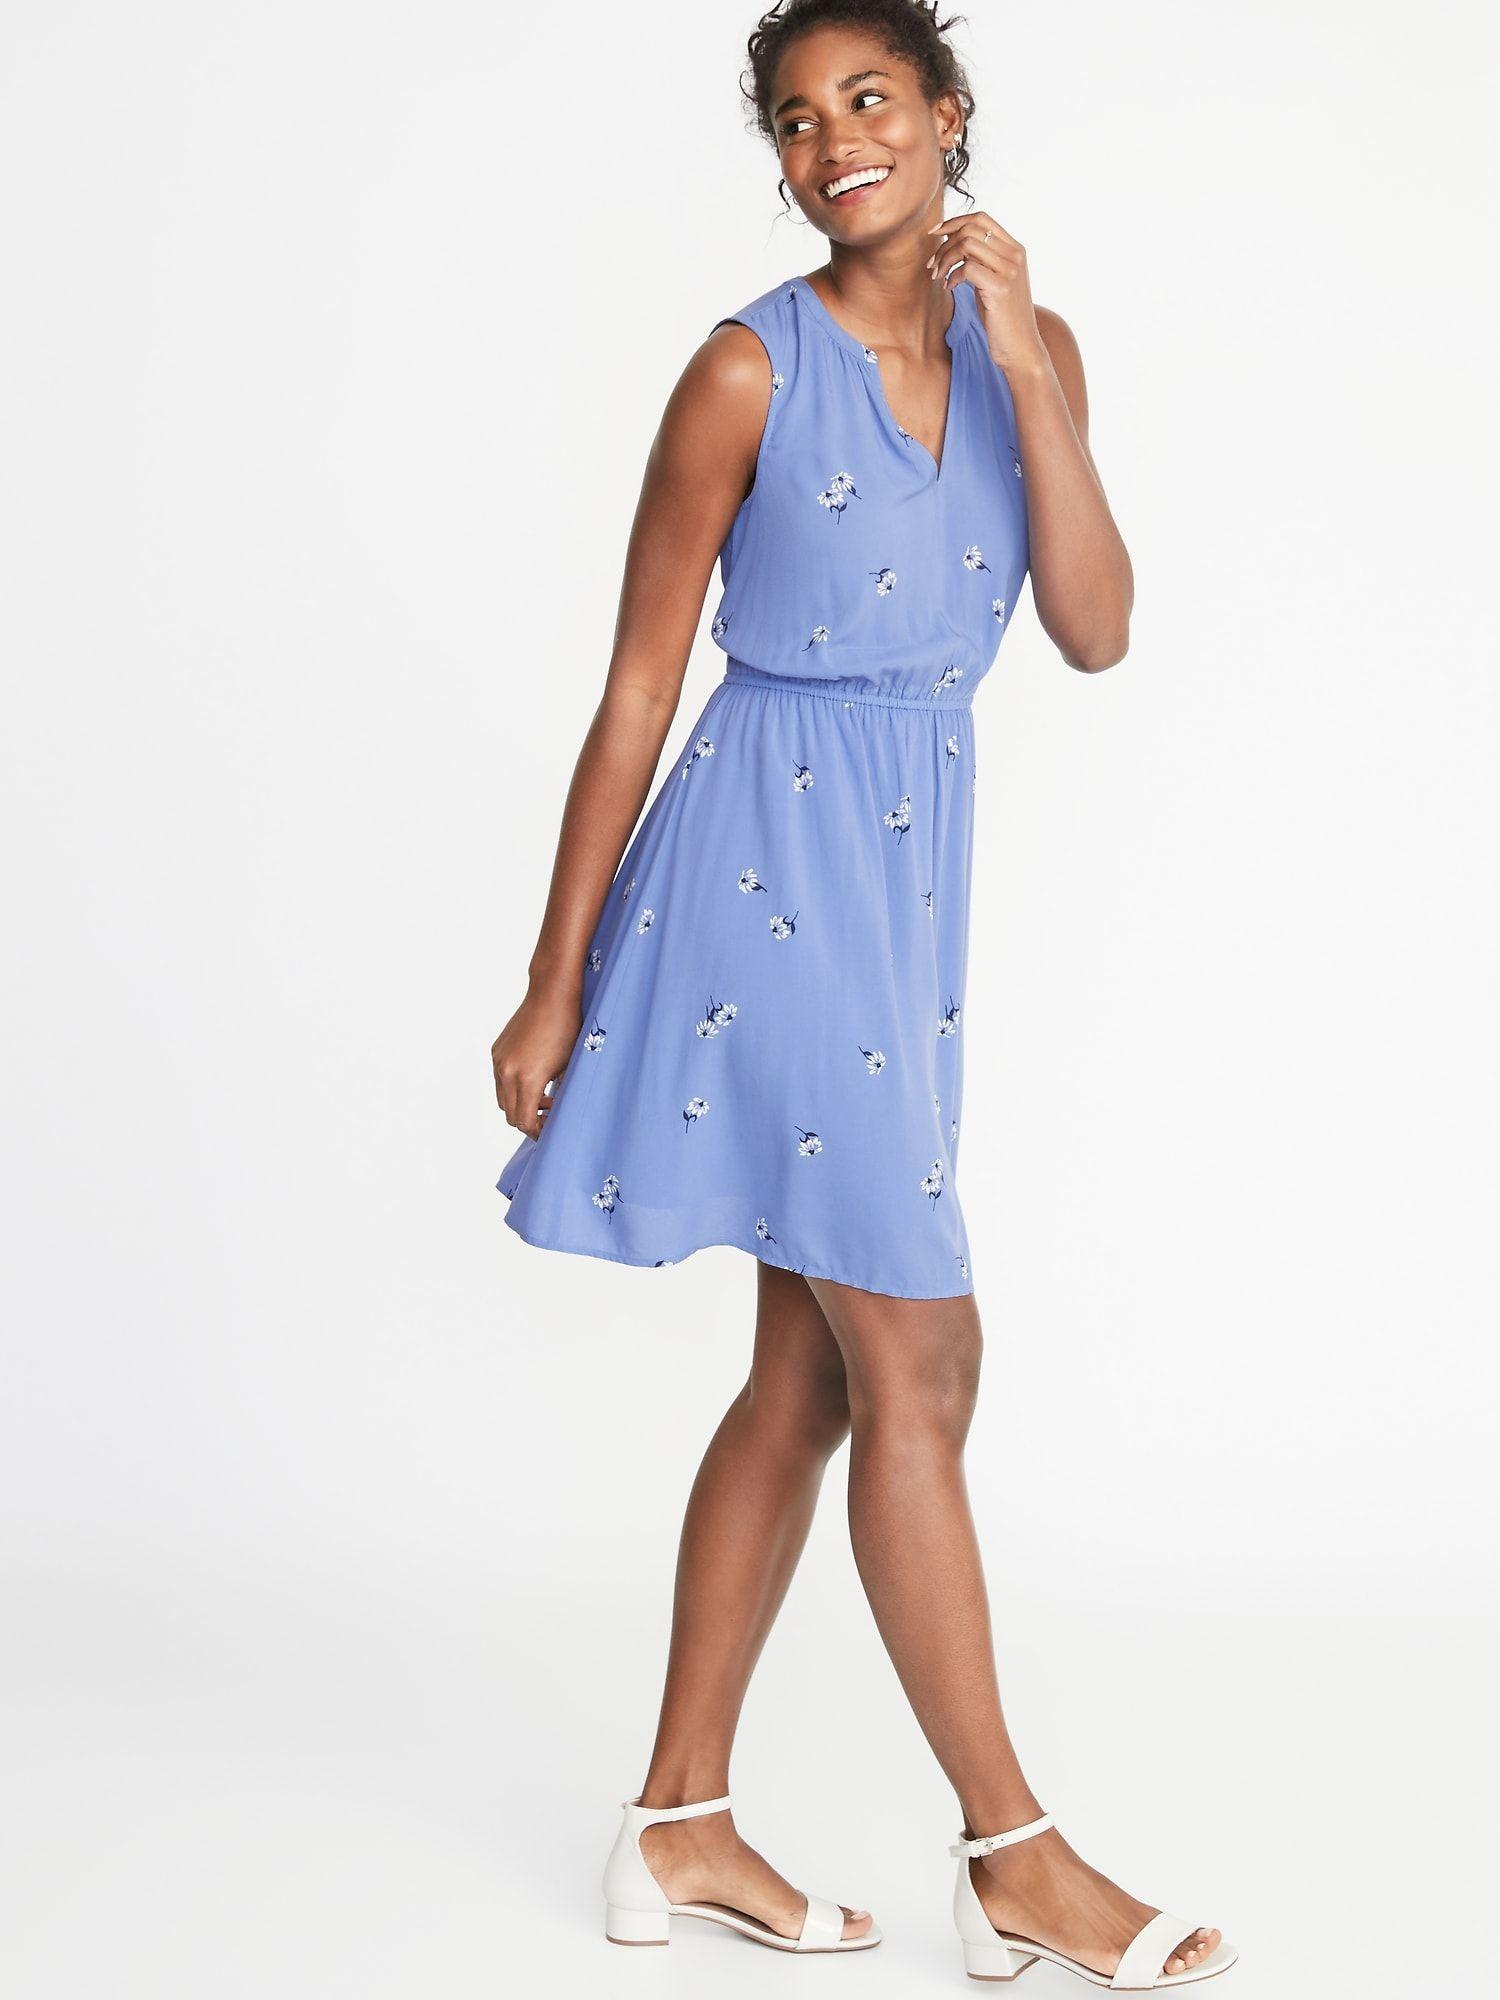 Waist-Defined Sleeveless Dress for